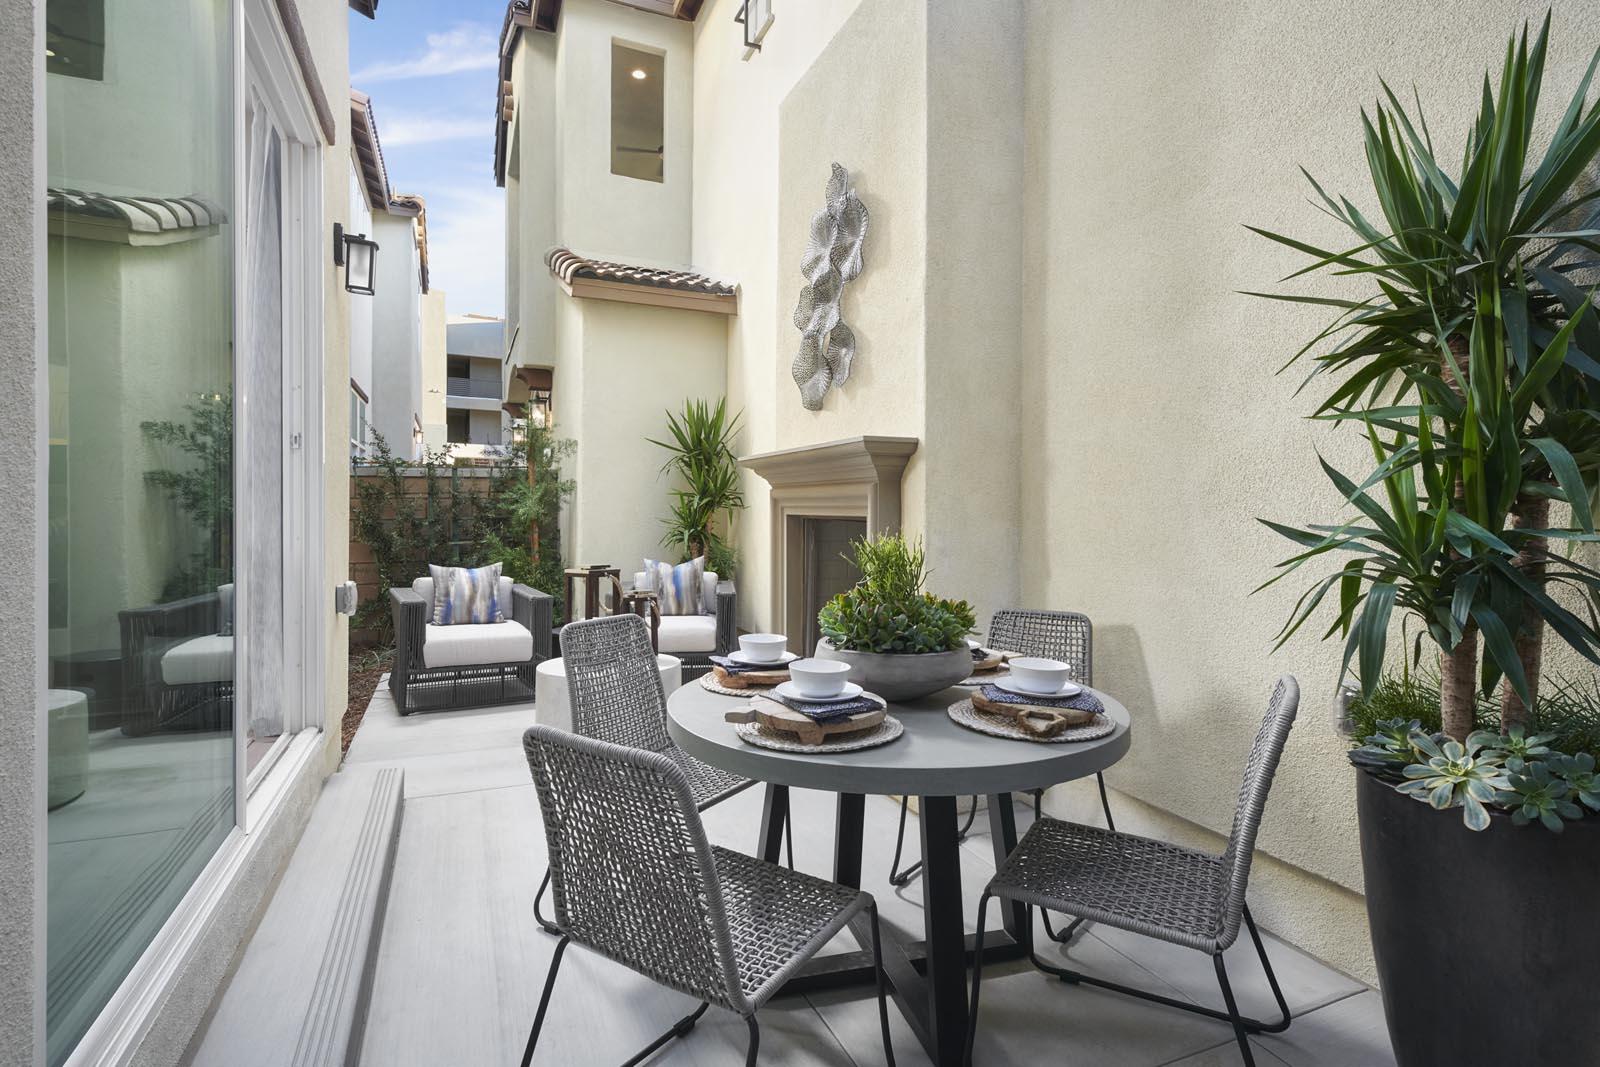 Patio   Residence 3   Lumin   New Homes in Rancho Cucamonga, CA   Van Daele Homes